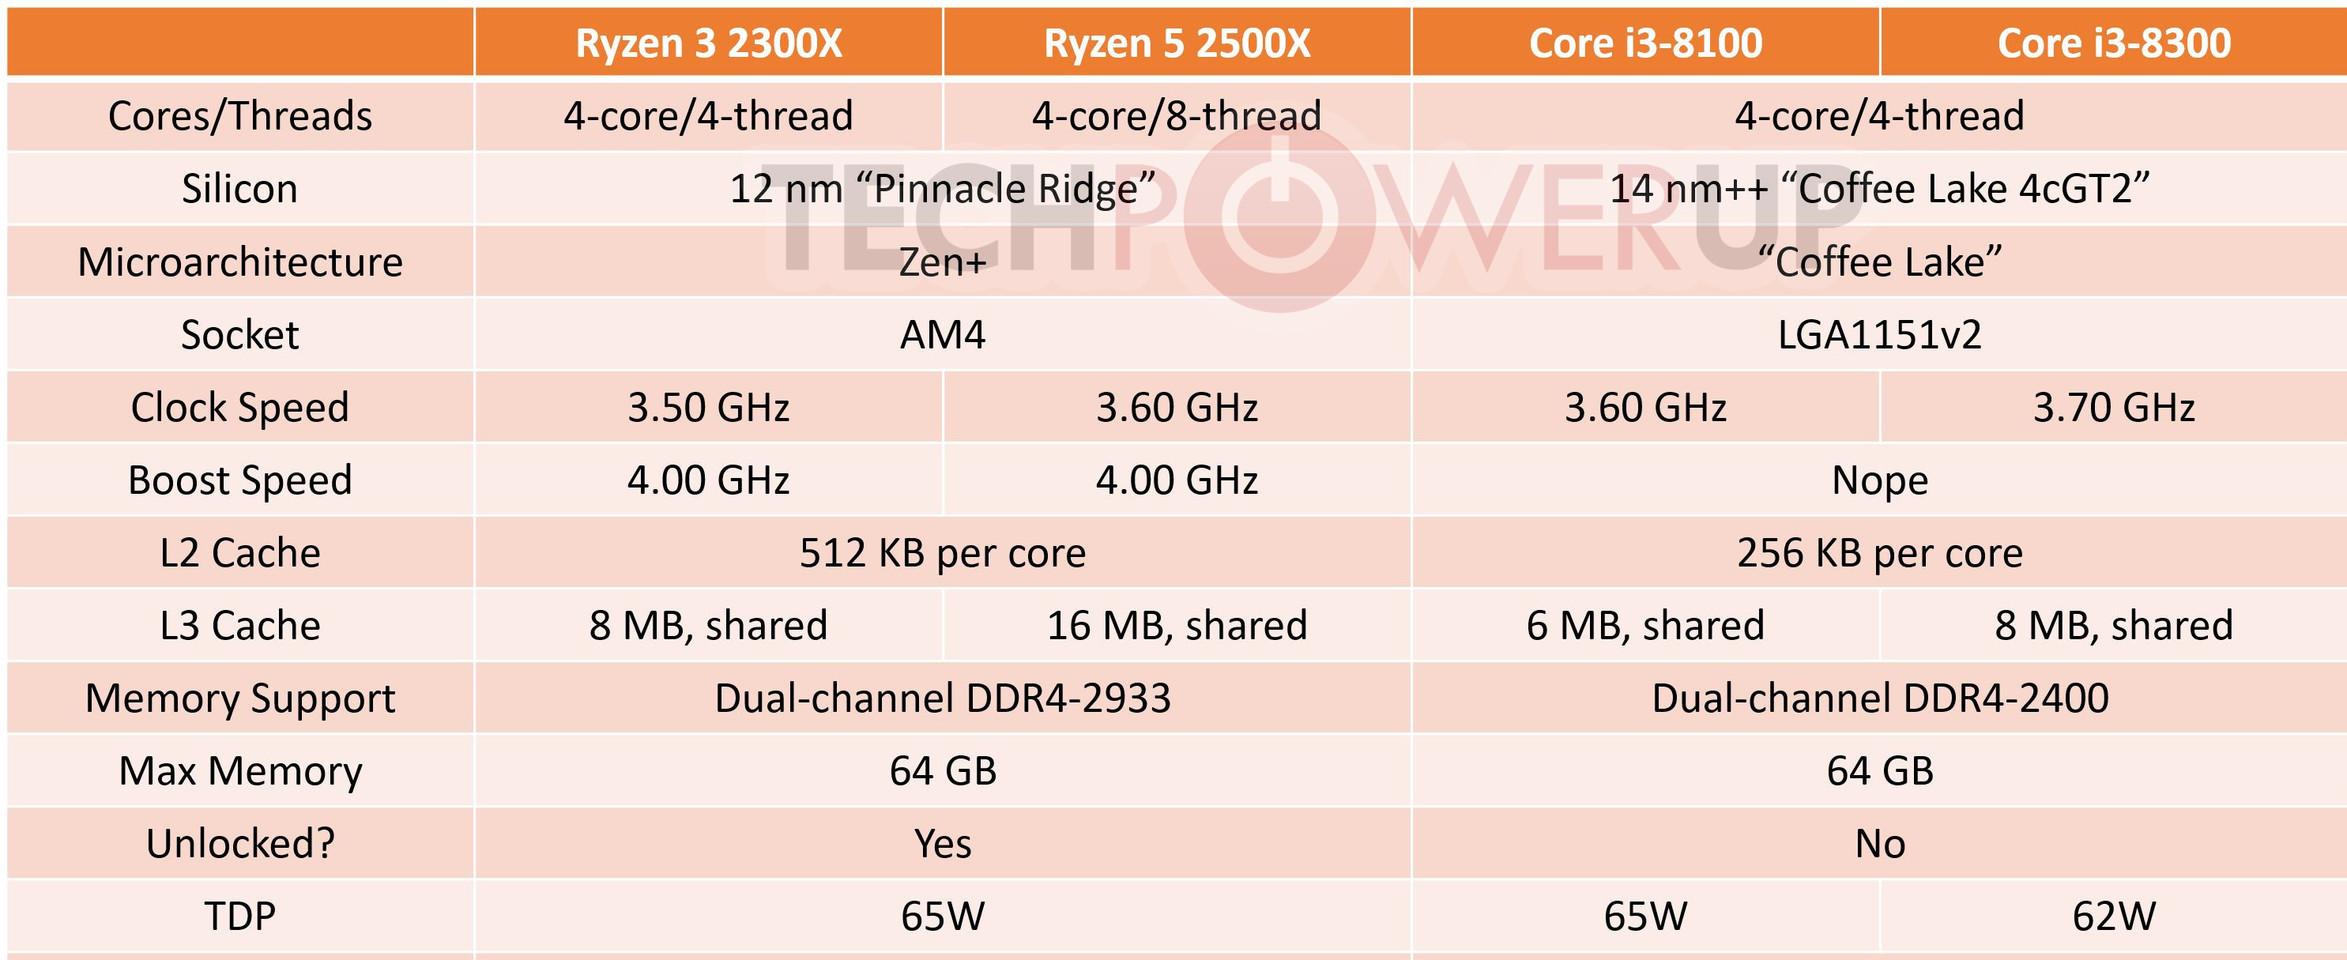 Lenovo Confirms AMD Ryzen 3 2300X and Ryzen 5 2500X Specs | TechPowerUp